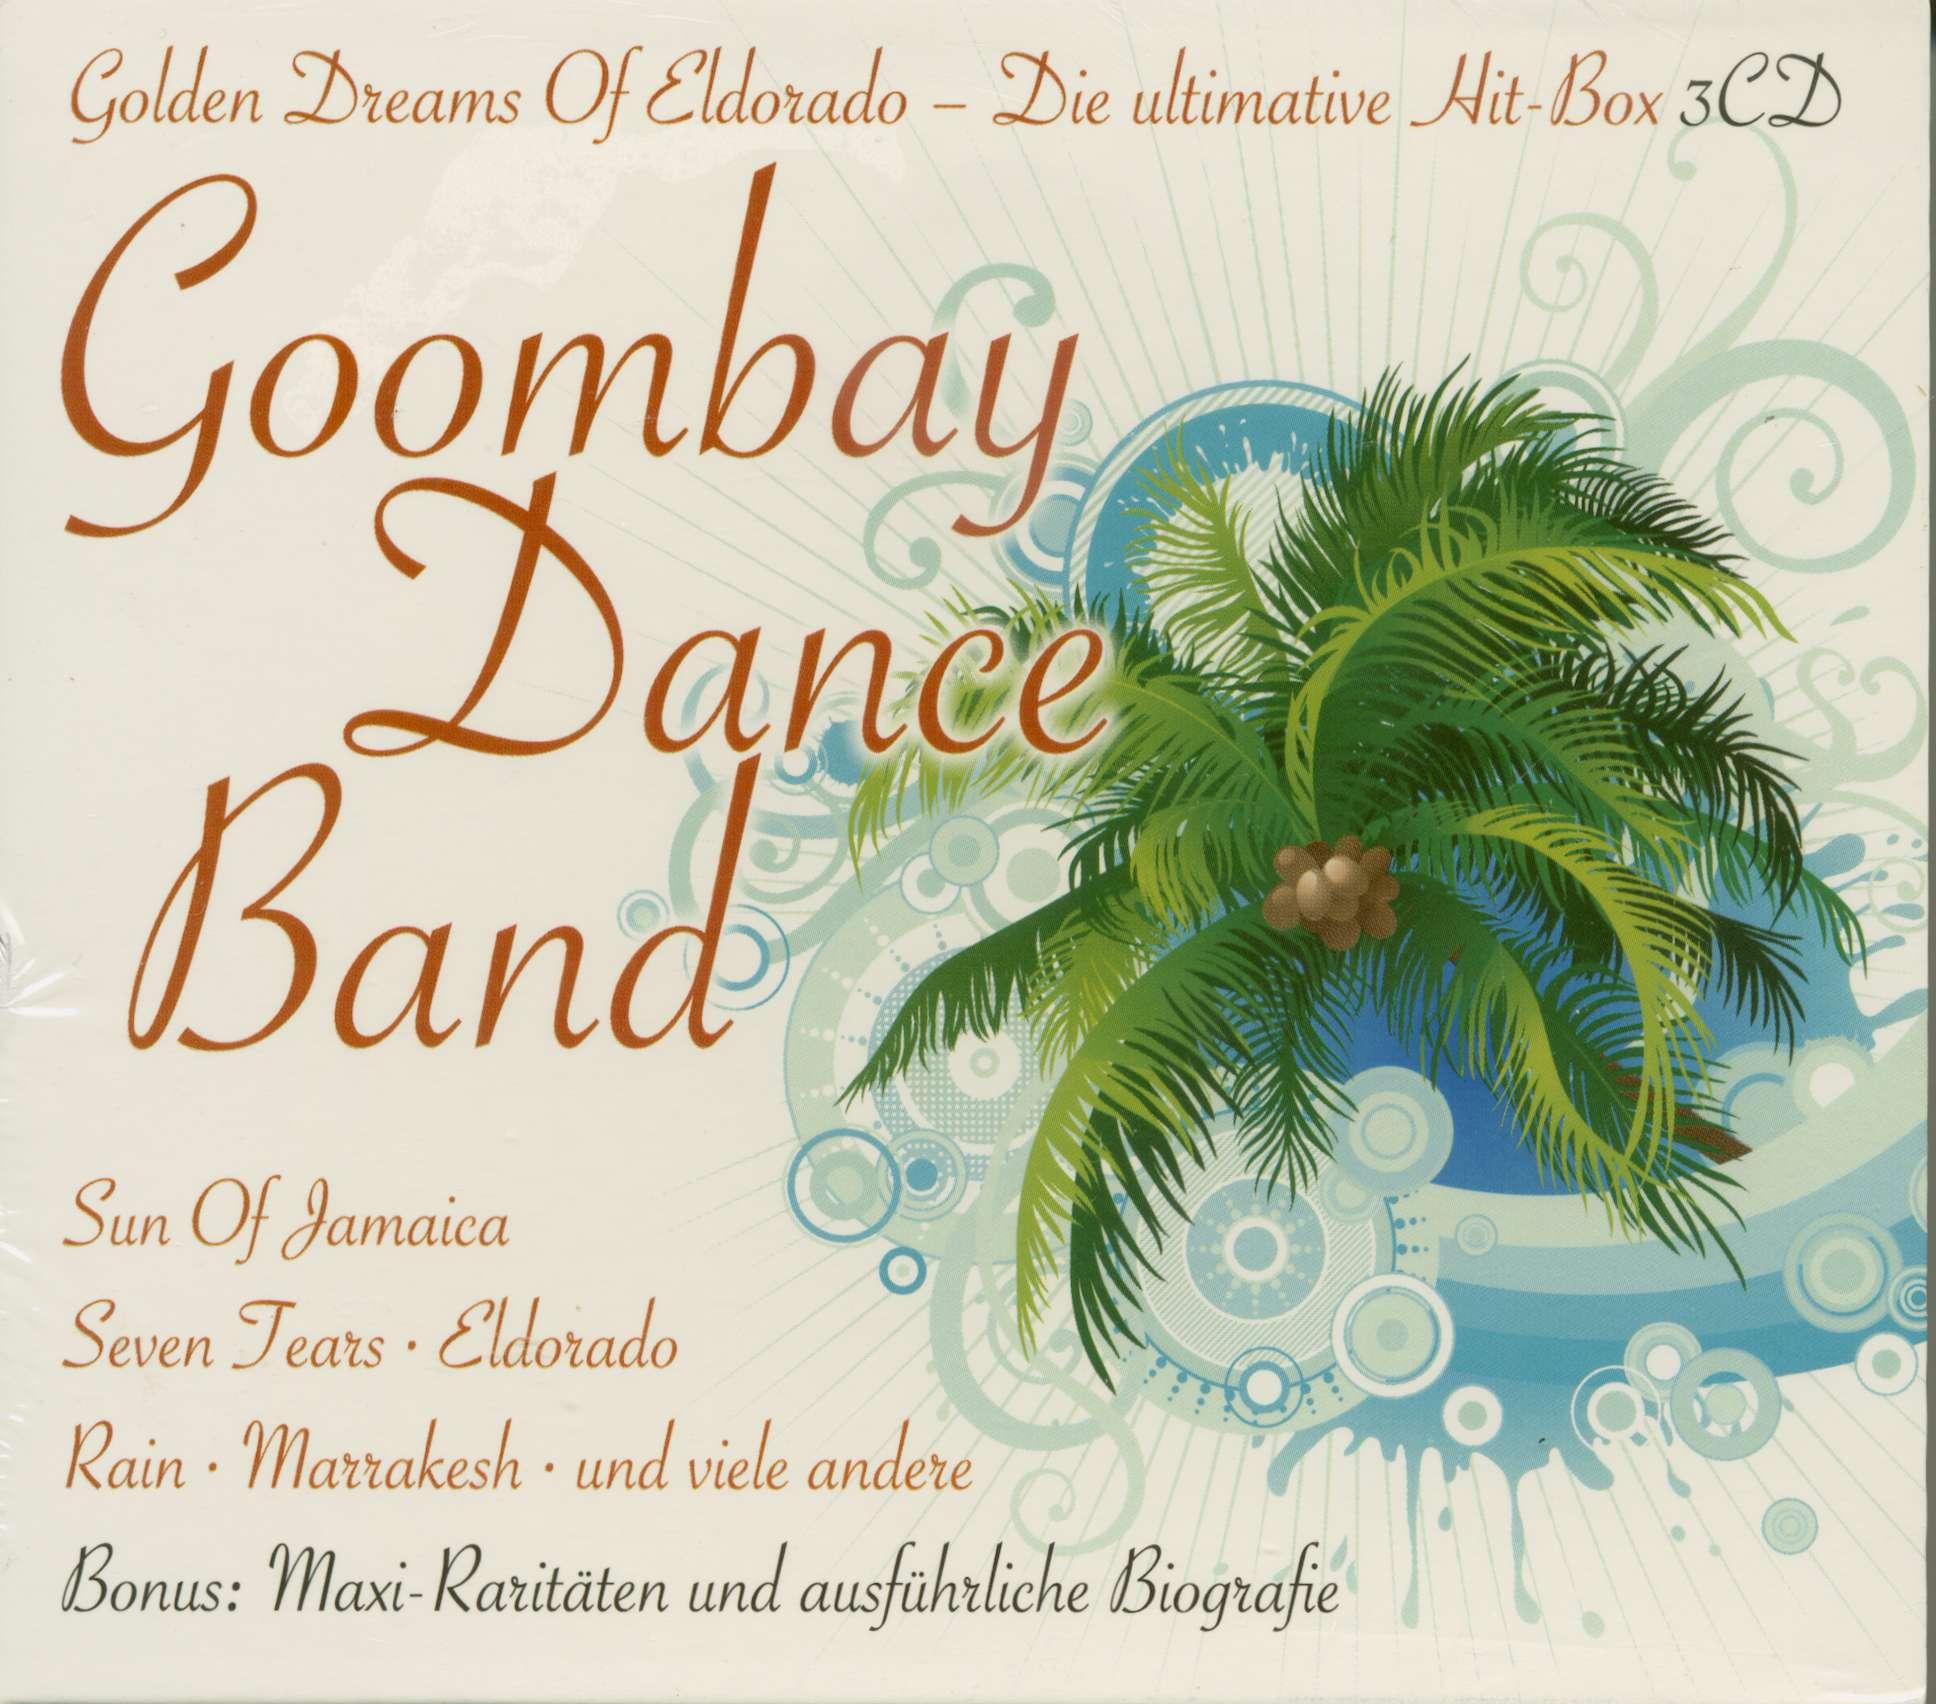 Goombay Dance Band CD: Die ultimative Hit-Box (3-CD) - Bear Family ...